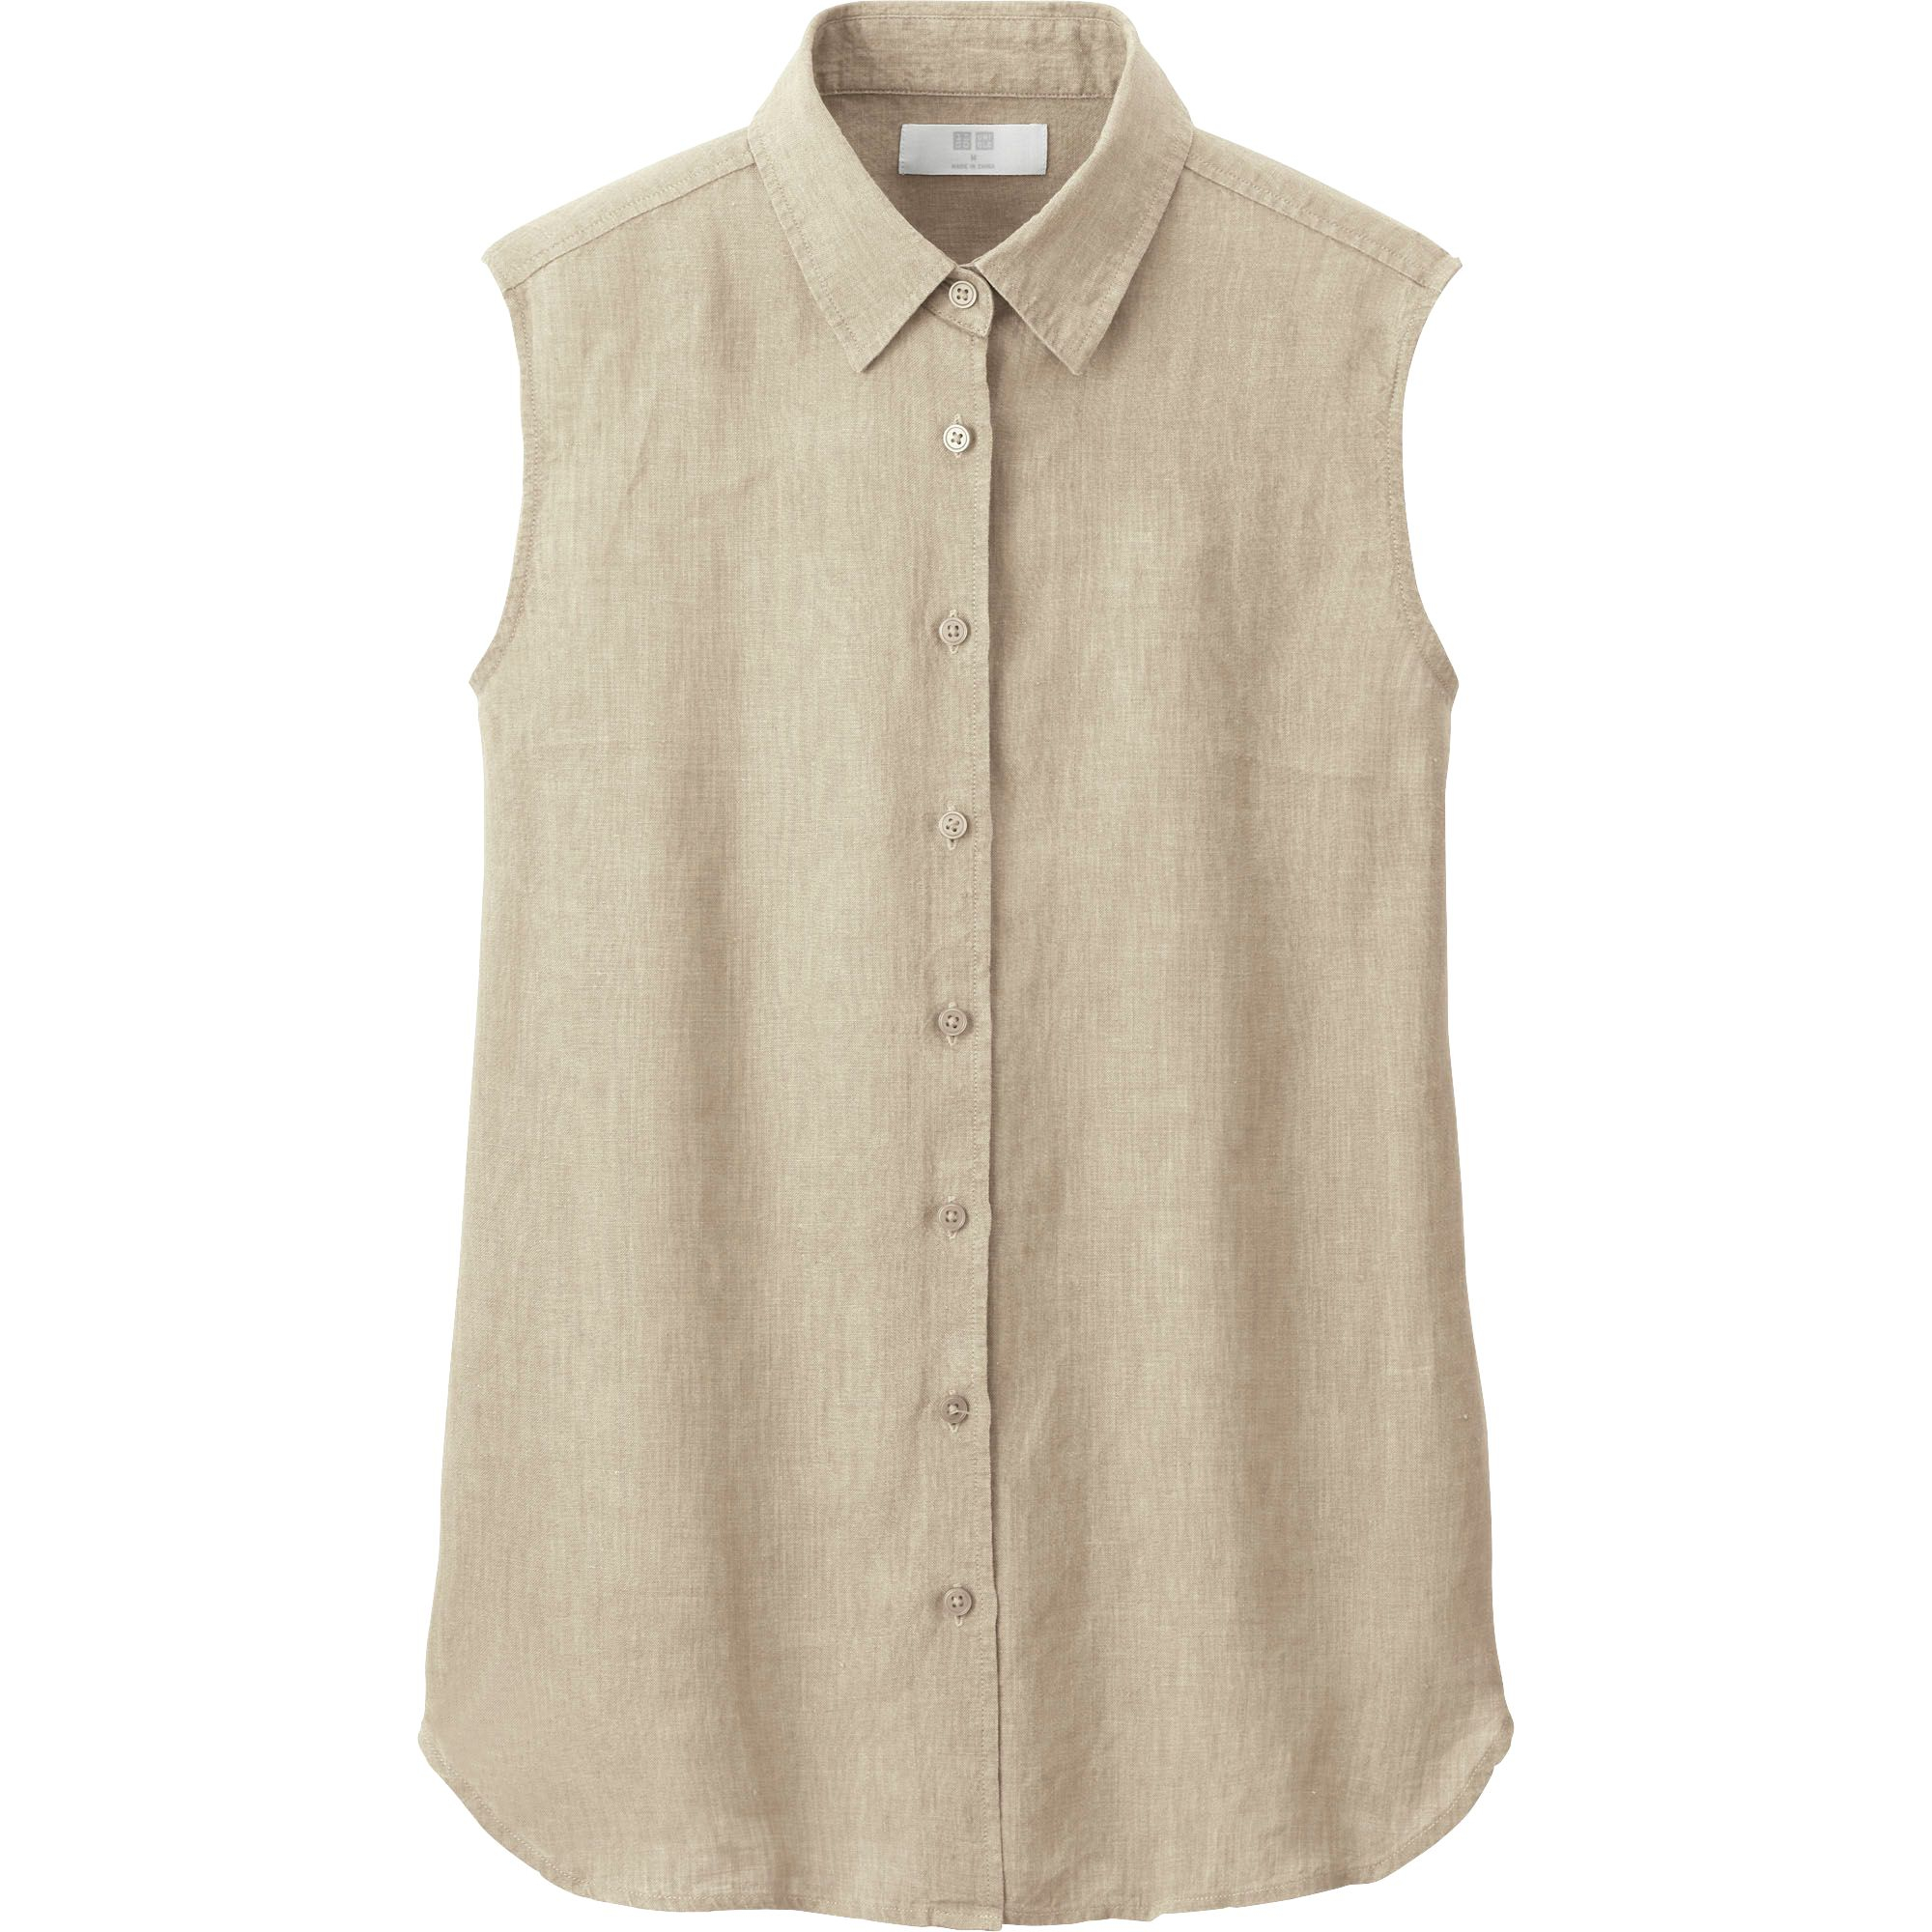 Uniqlo premium linen sleeveless shirt in beige lyst for Uniqlo premium t shirt